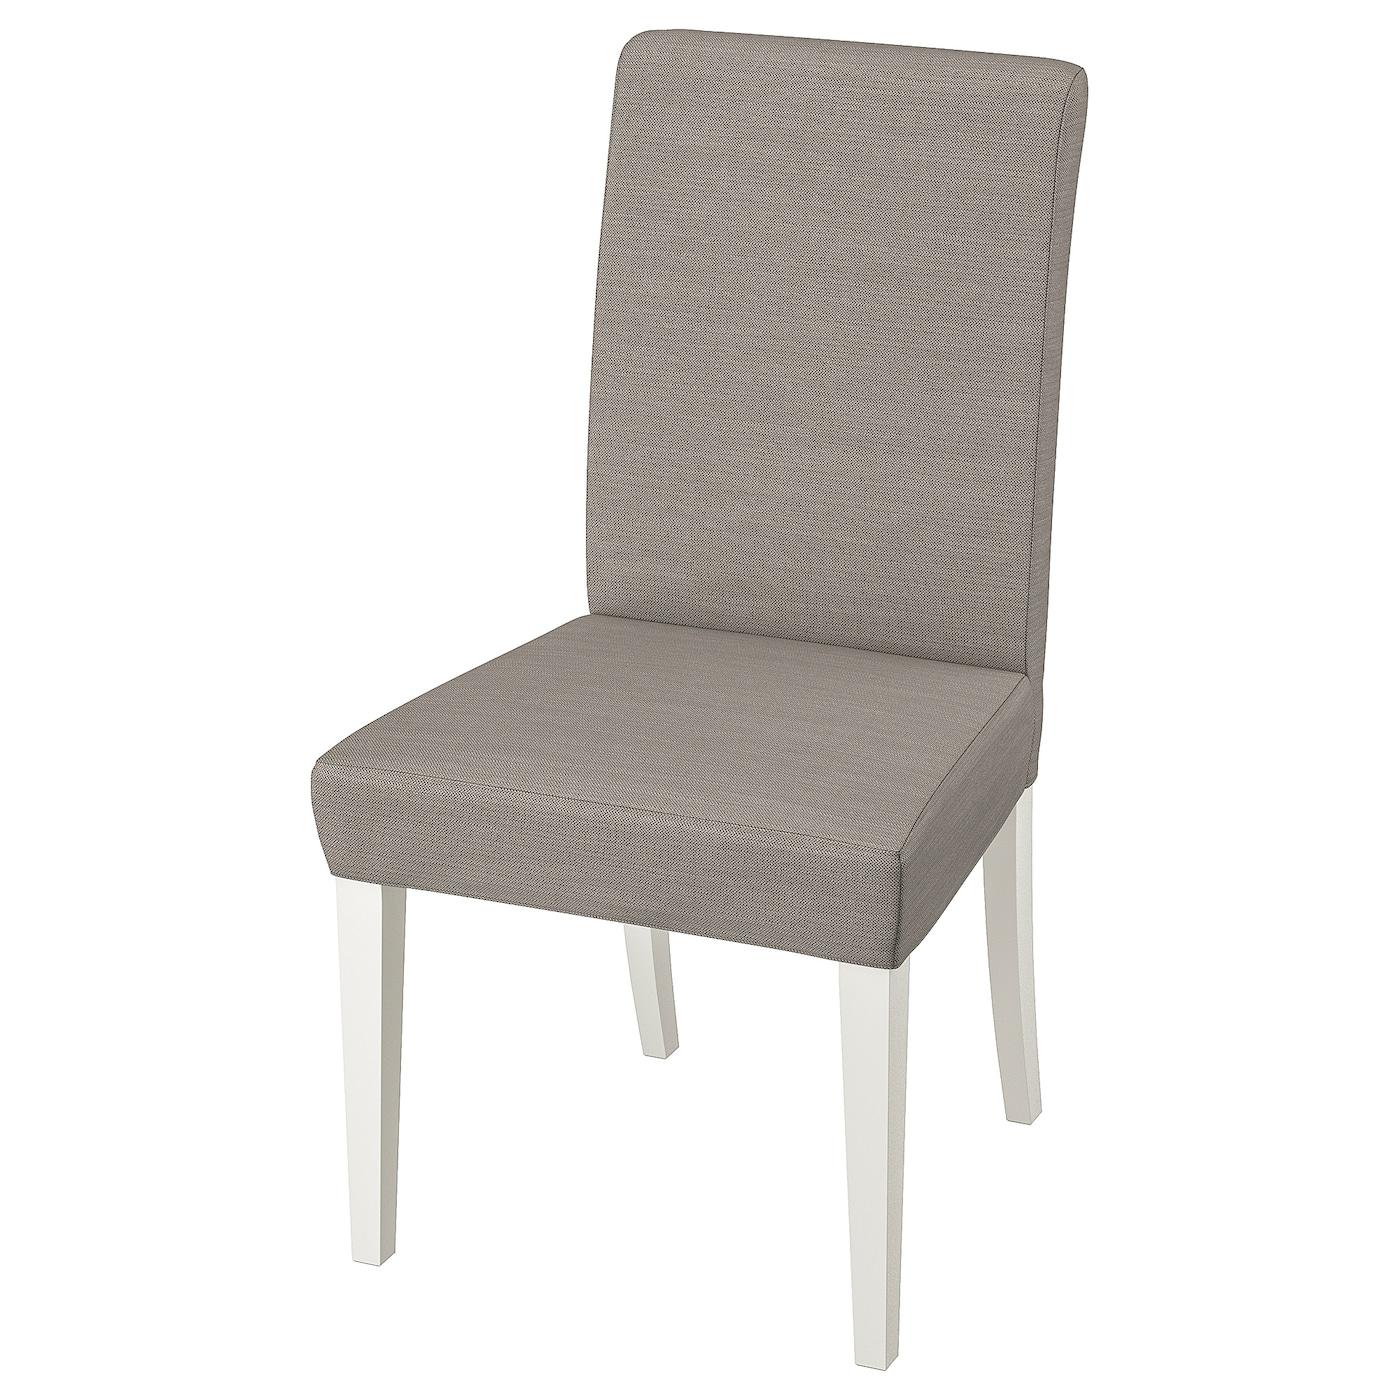 HENRIKSDAL Stuhl, Nolhaga graubeige. Informiere dich hier